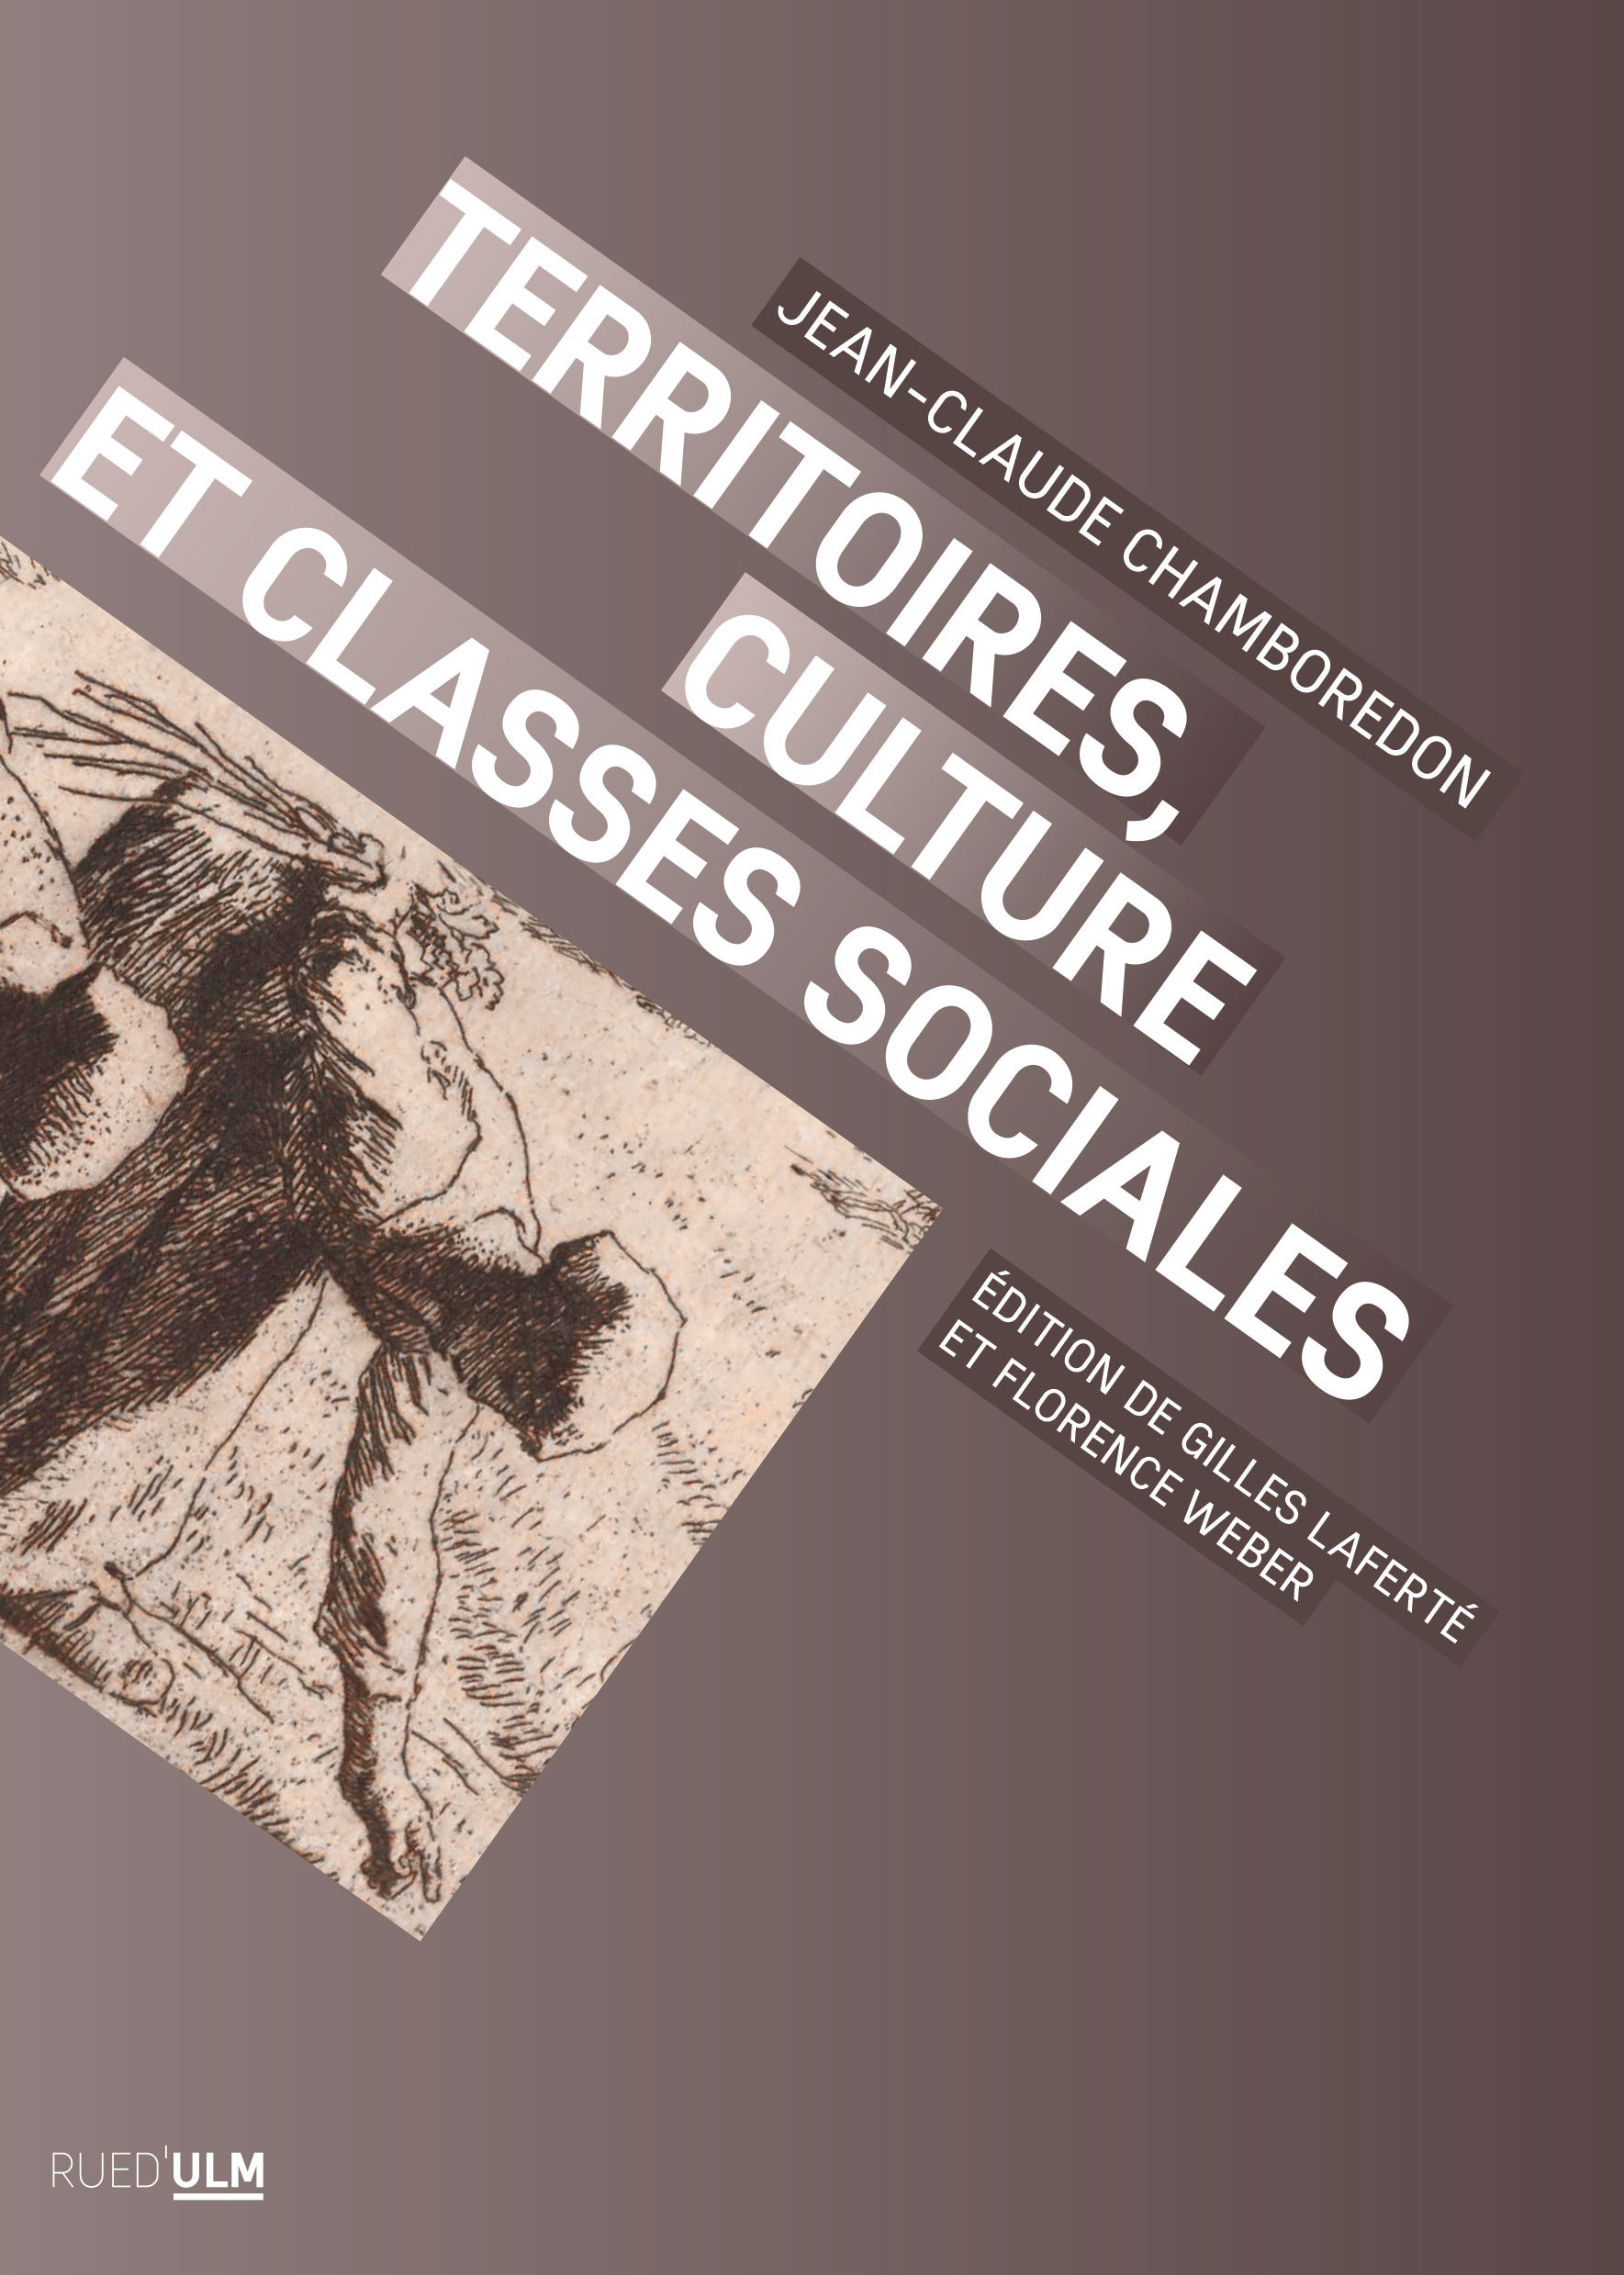 TERRITOIRES, CULTURE ET CLASSES SOCIALES